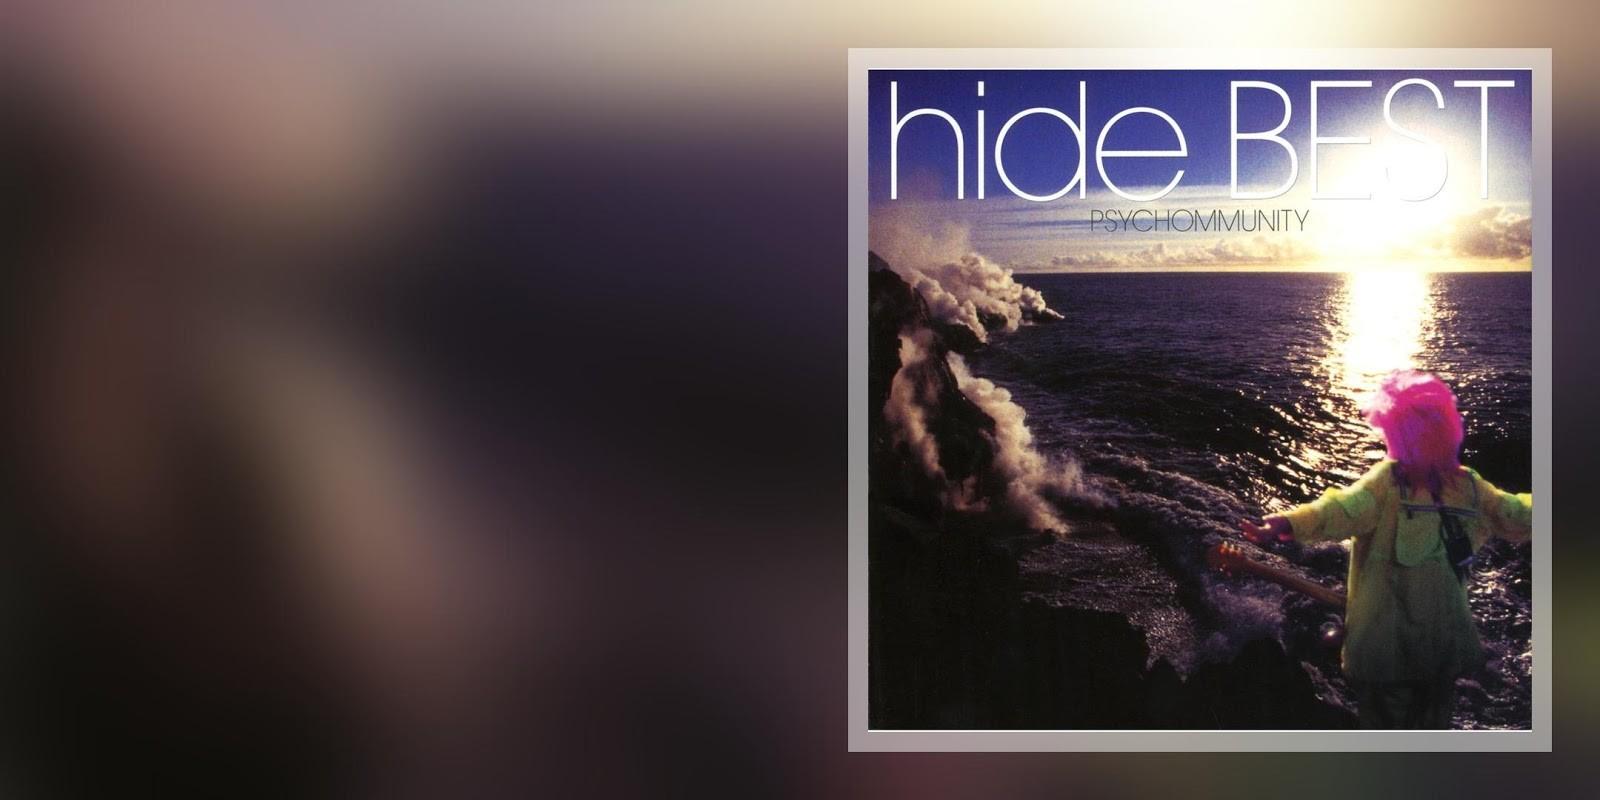 General 1600x800 album covers cover art J Rock hide (musician) music